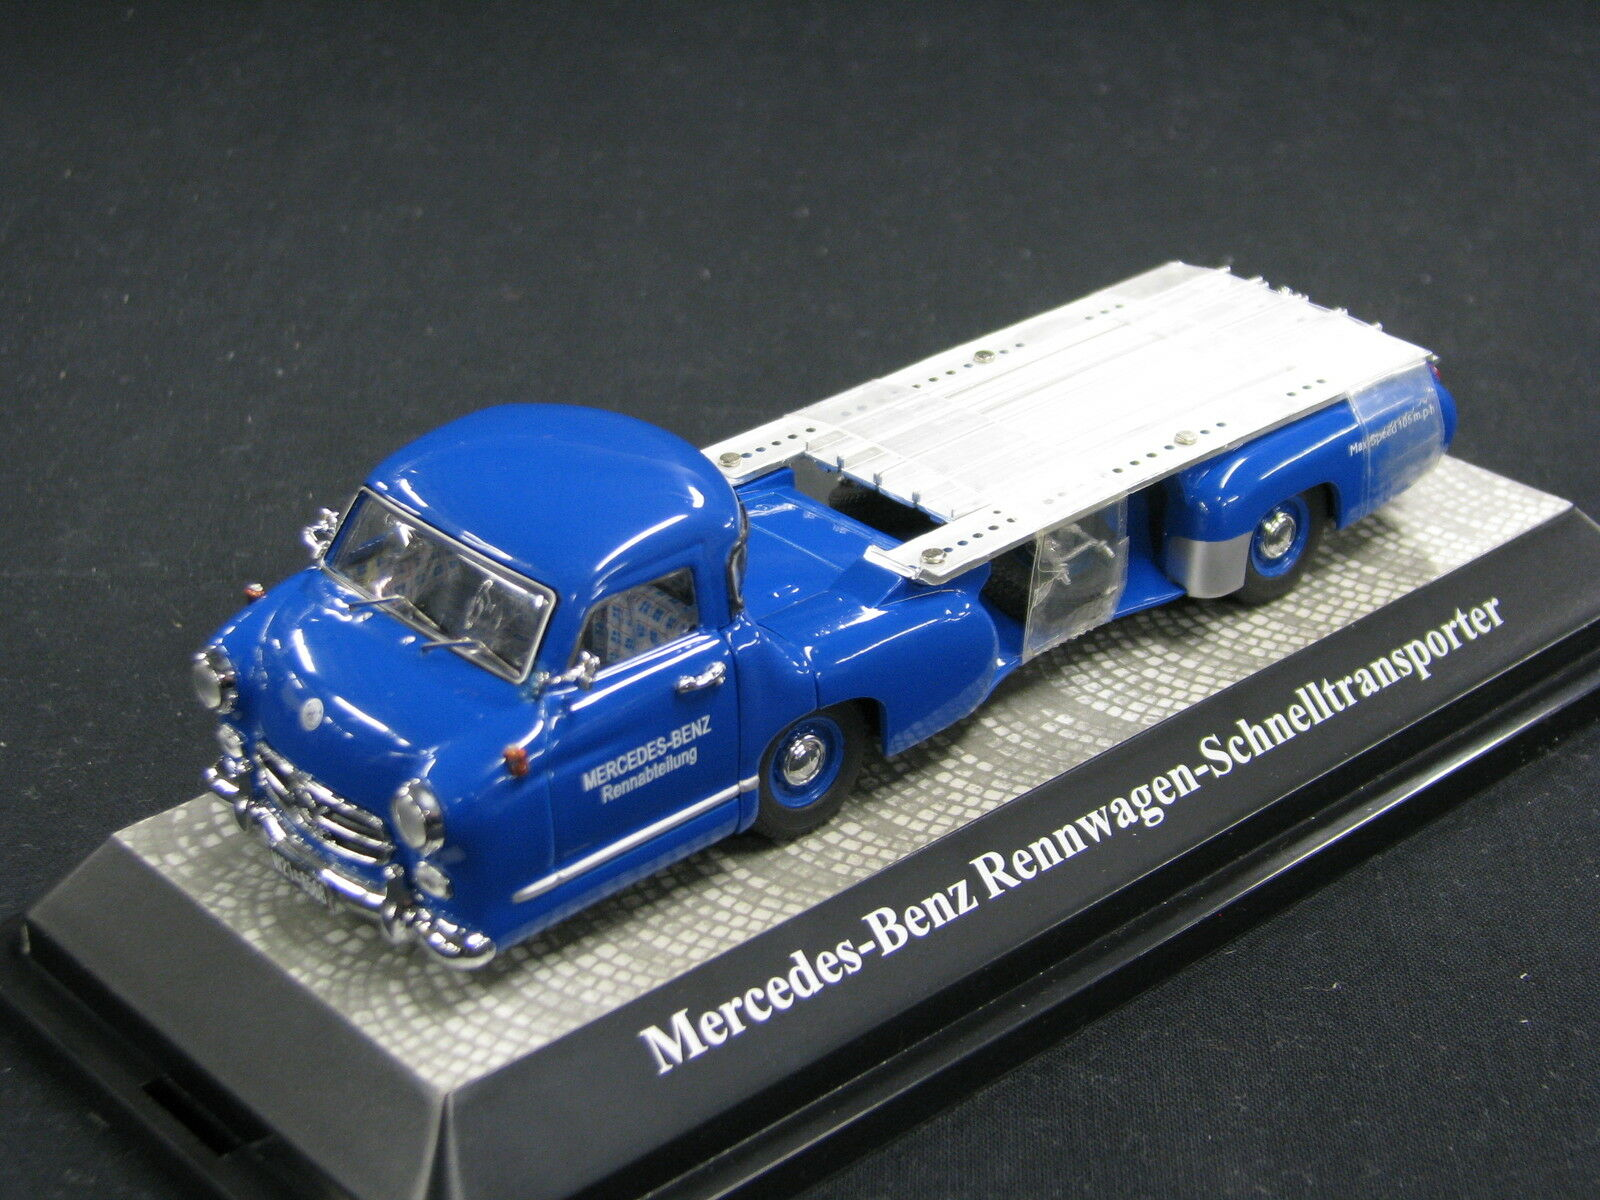 edición limitada en caliente MB Mercedes-Benz Rennwagen-schnelltransporter 1 43  MB Rennabteilung  (JS) (JS) (JS)  punto de venta en línea